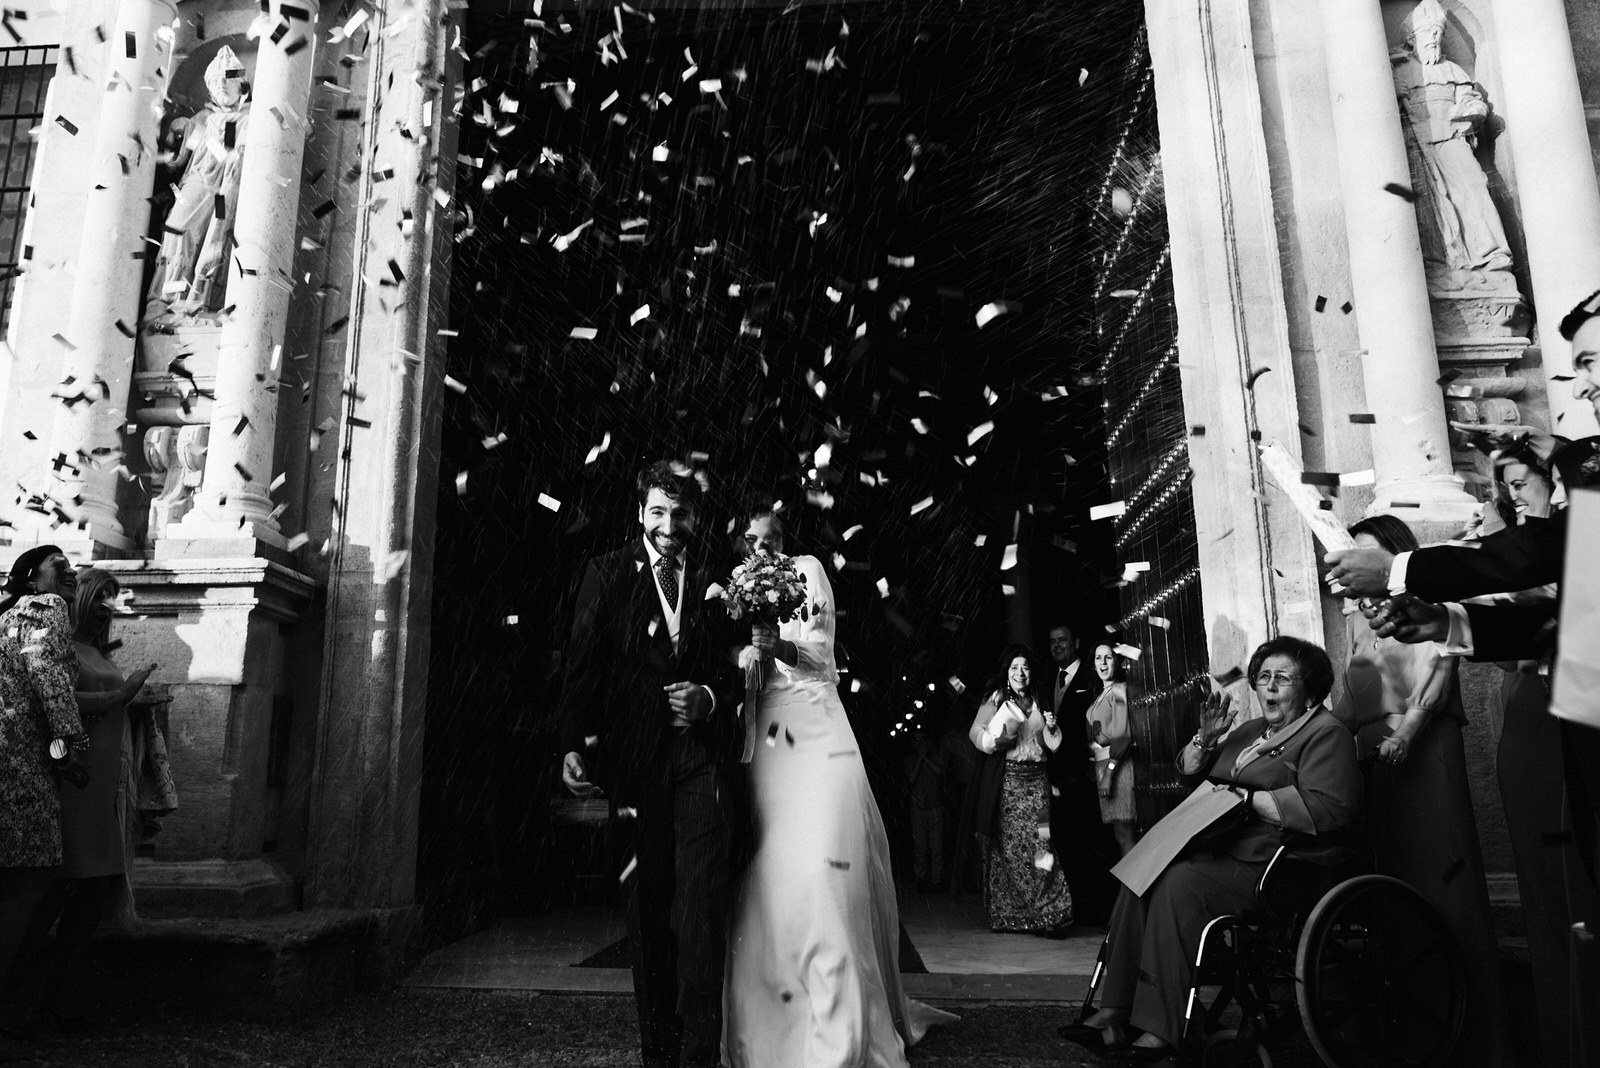 fotografo de bodas sevilla - fotografo boda - fotografía sevilla - Andrés AmarilloAAA_3191-2- fine.JPG